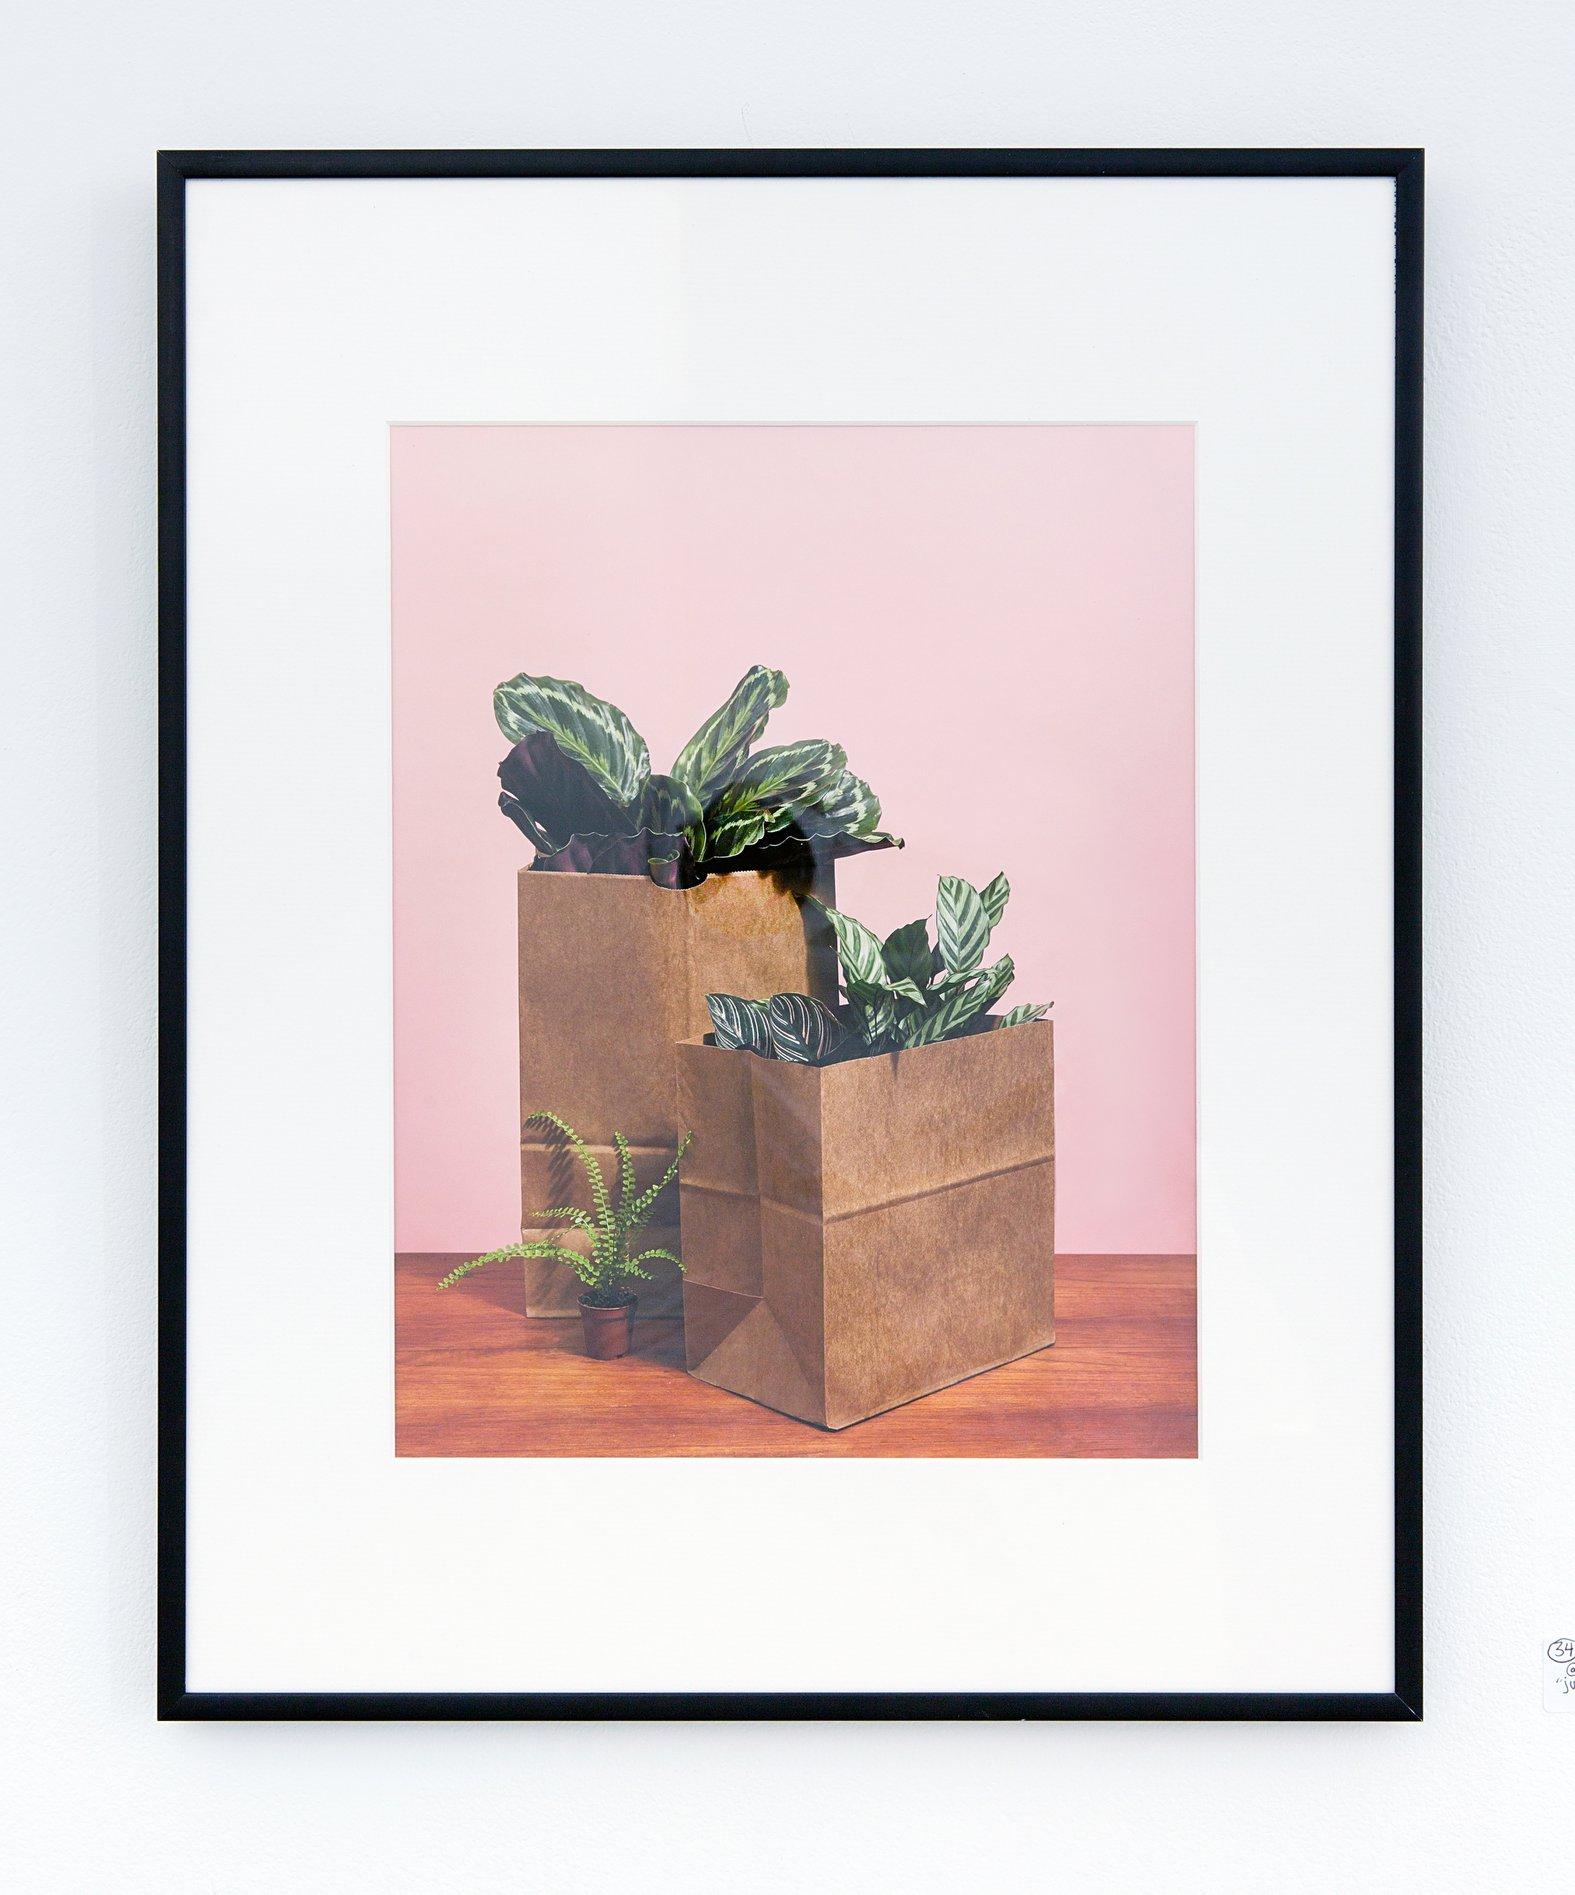 "Lauren Mazotta - ""Just the essentials"" Insta: @Laurenmazzotta  For Sale: $150"